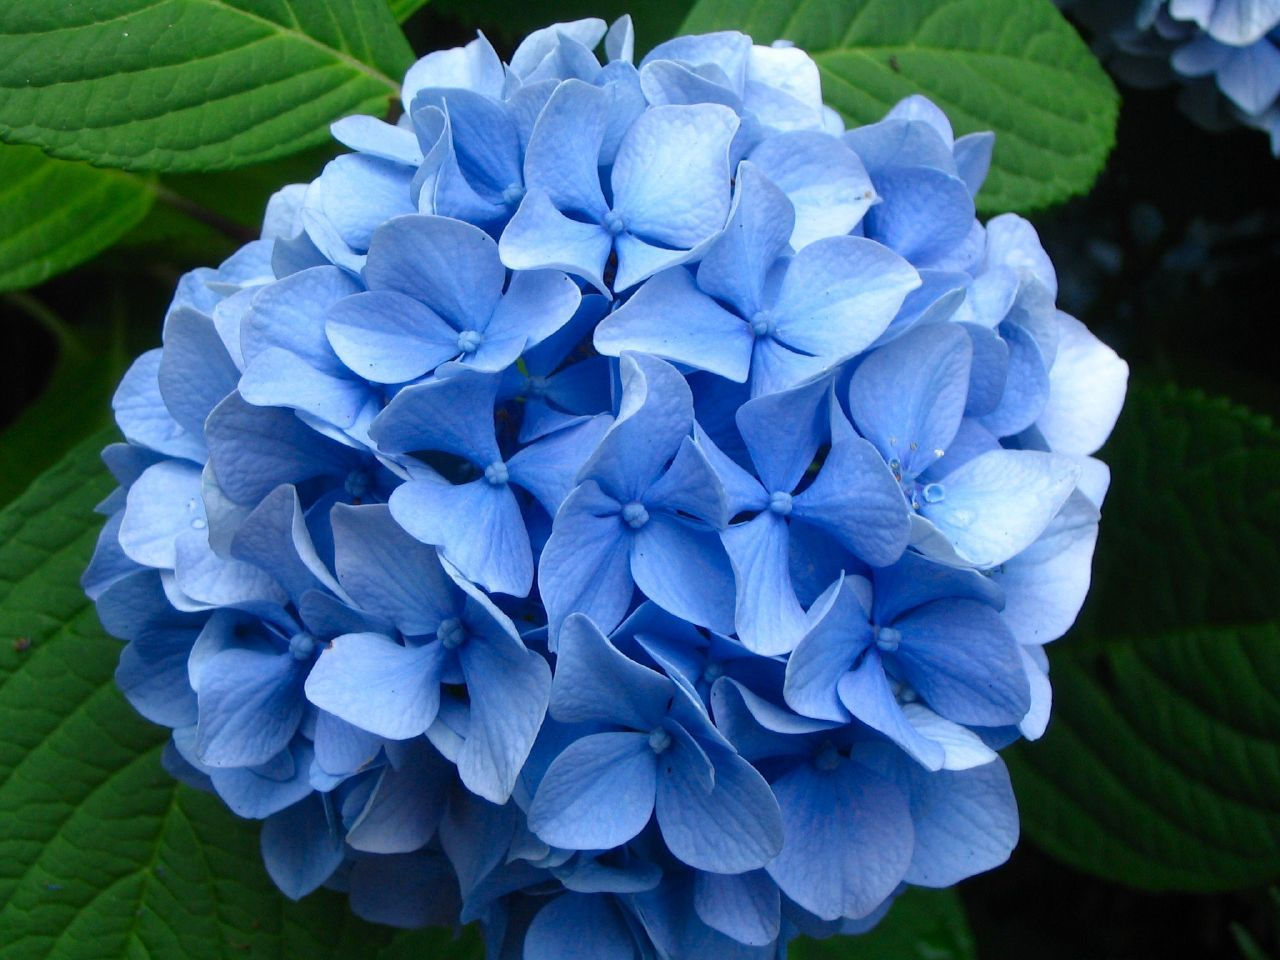 Hydrangea Expensive Flowers Hydrangea Care Growing Hydrangeas